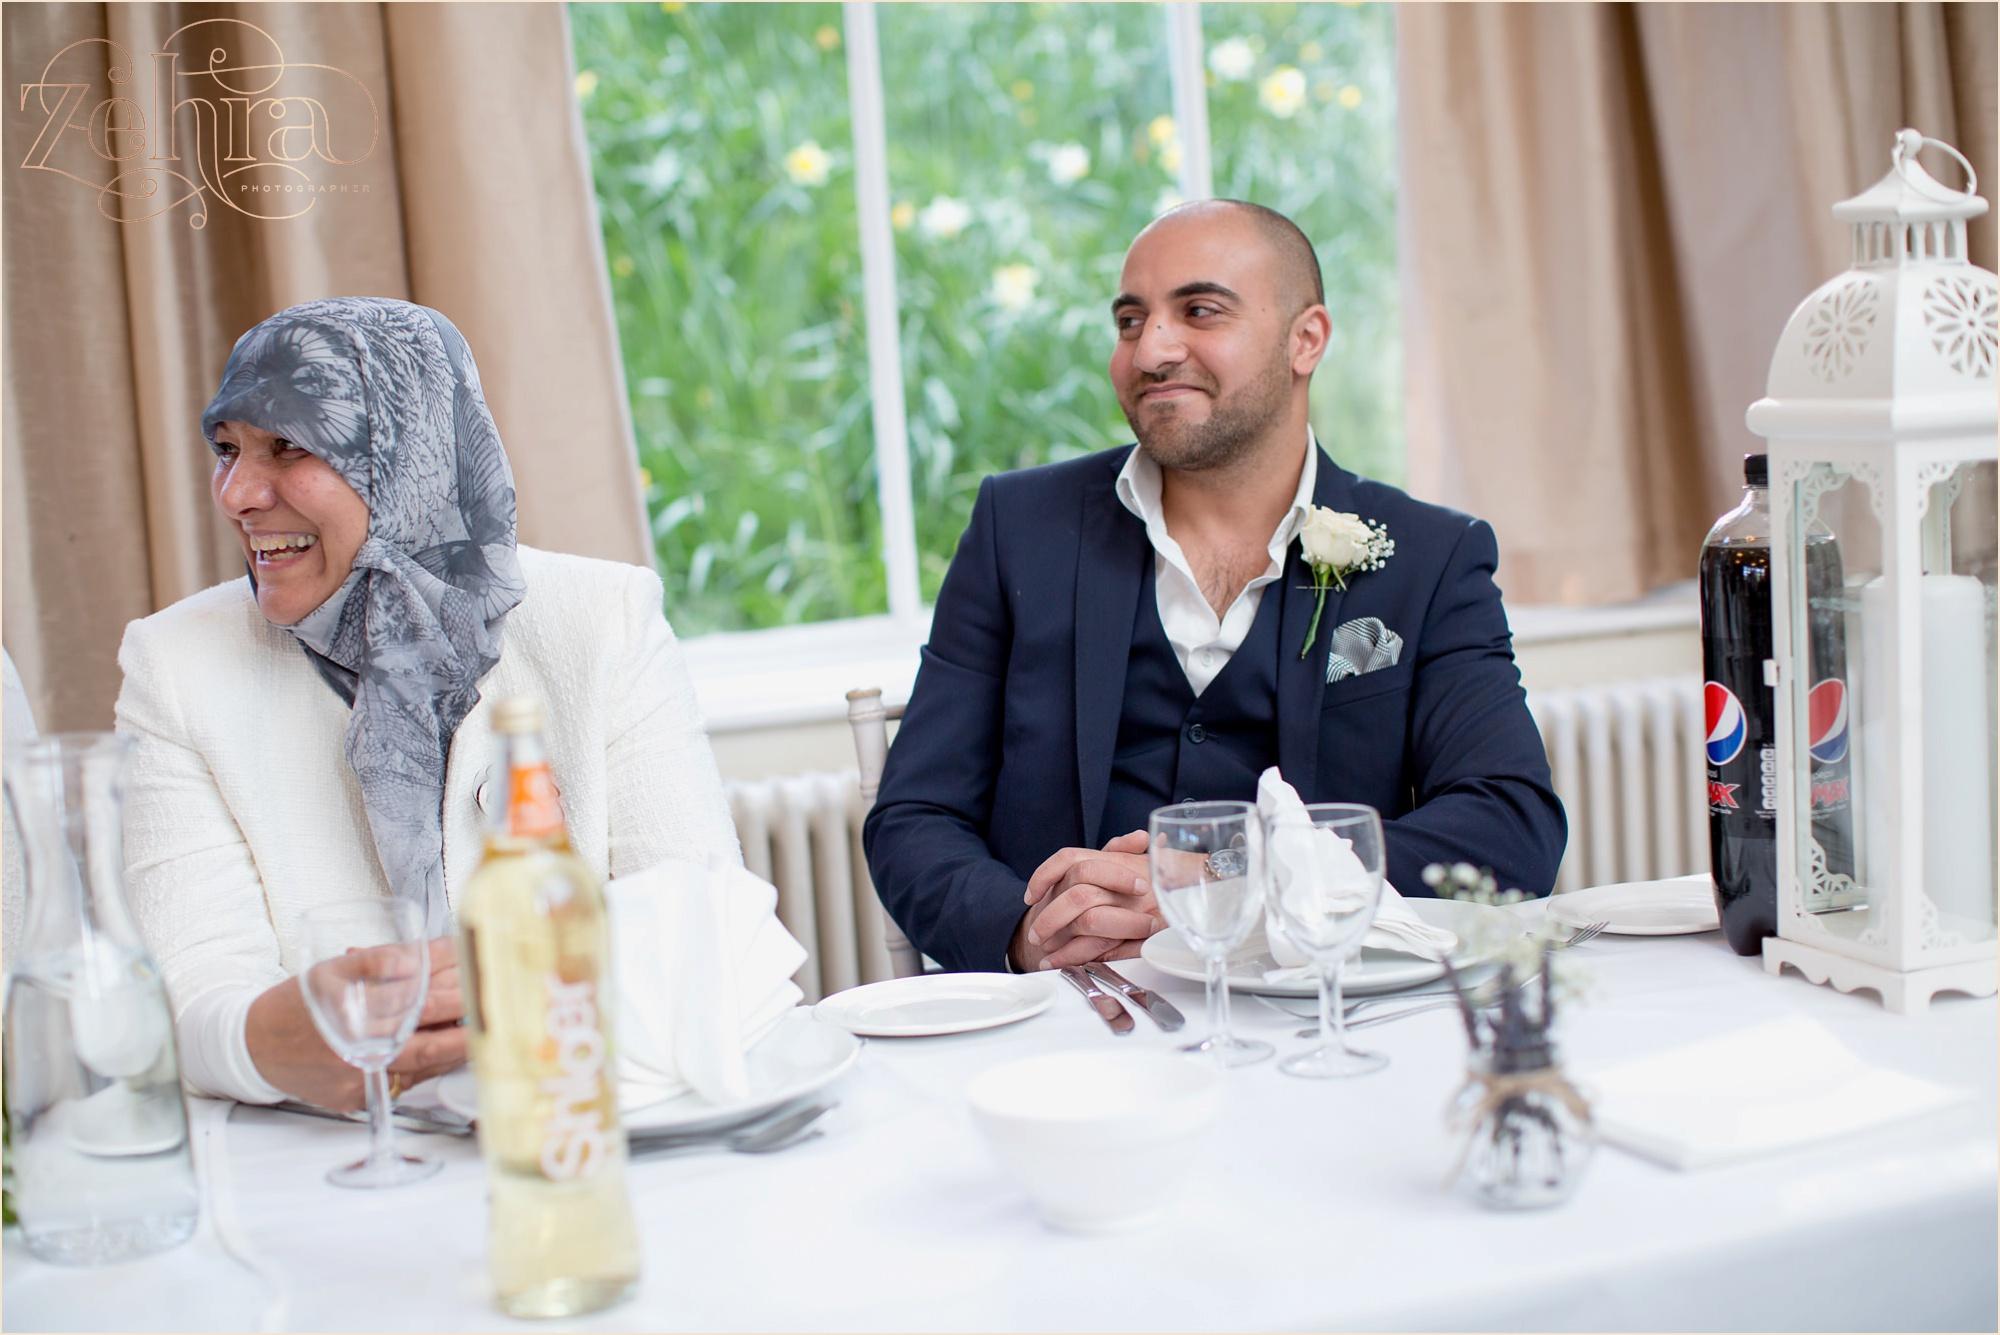 jasira manchester wedding photographer_0097.jpg